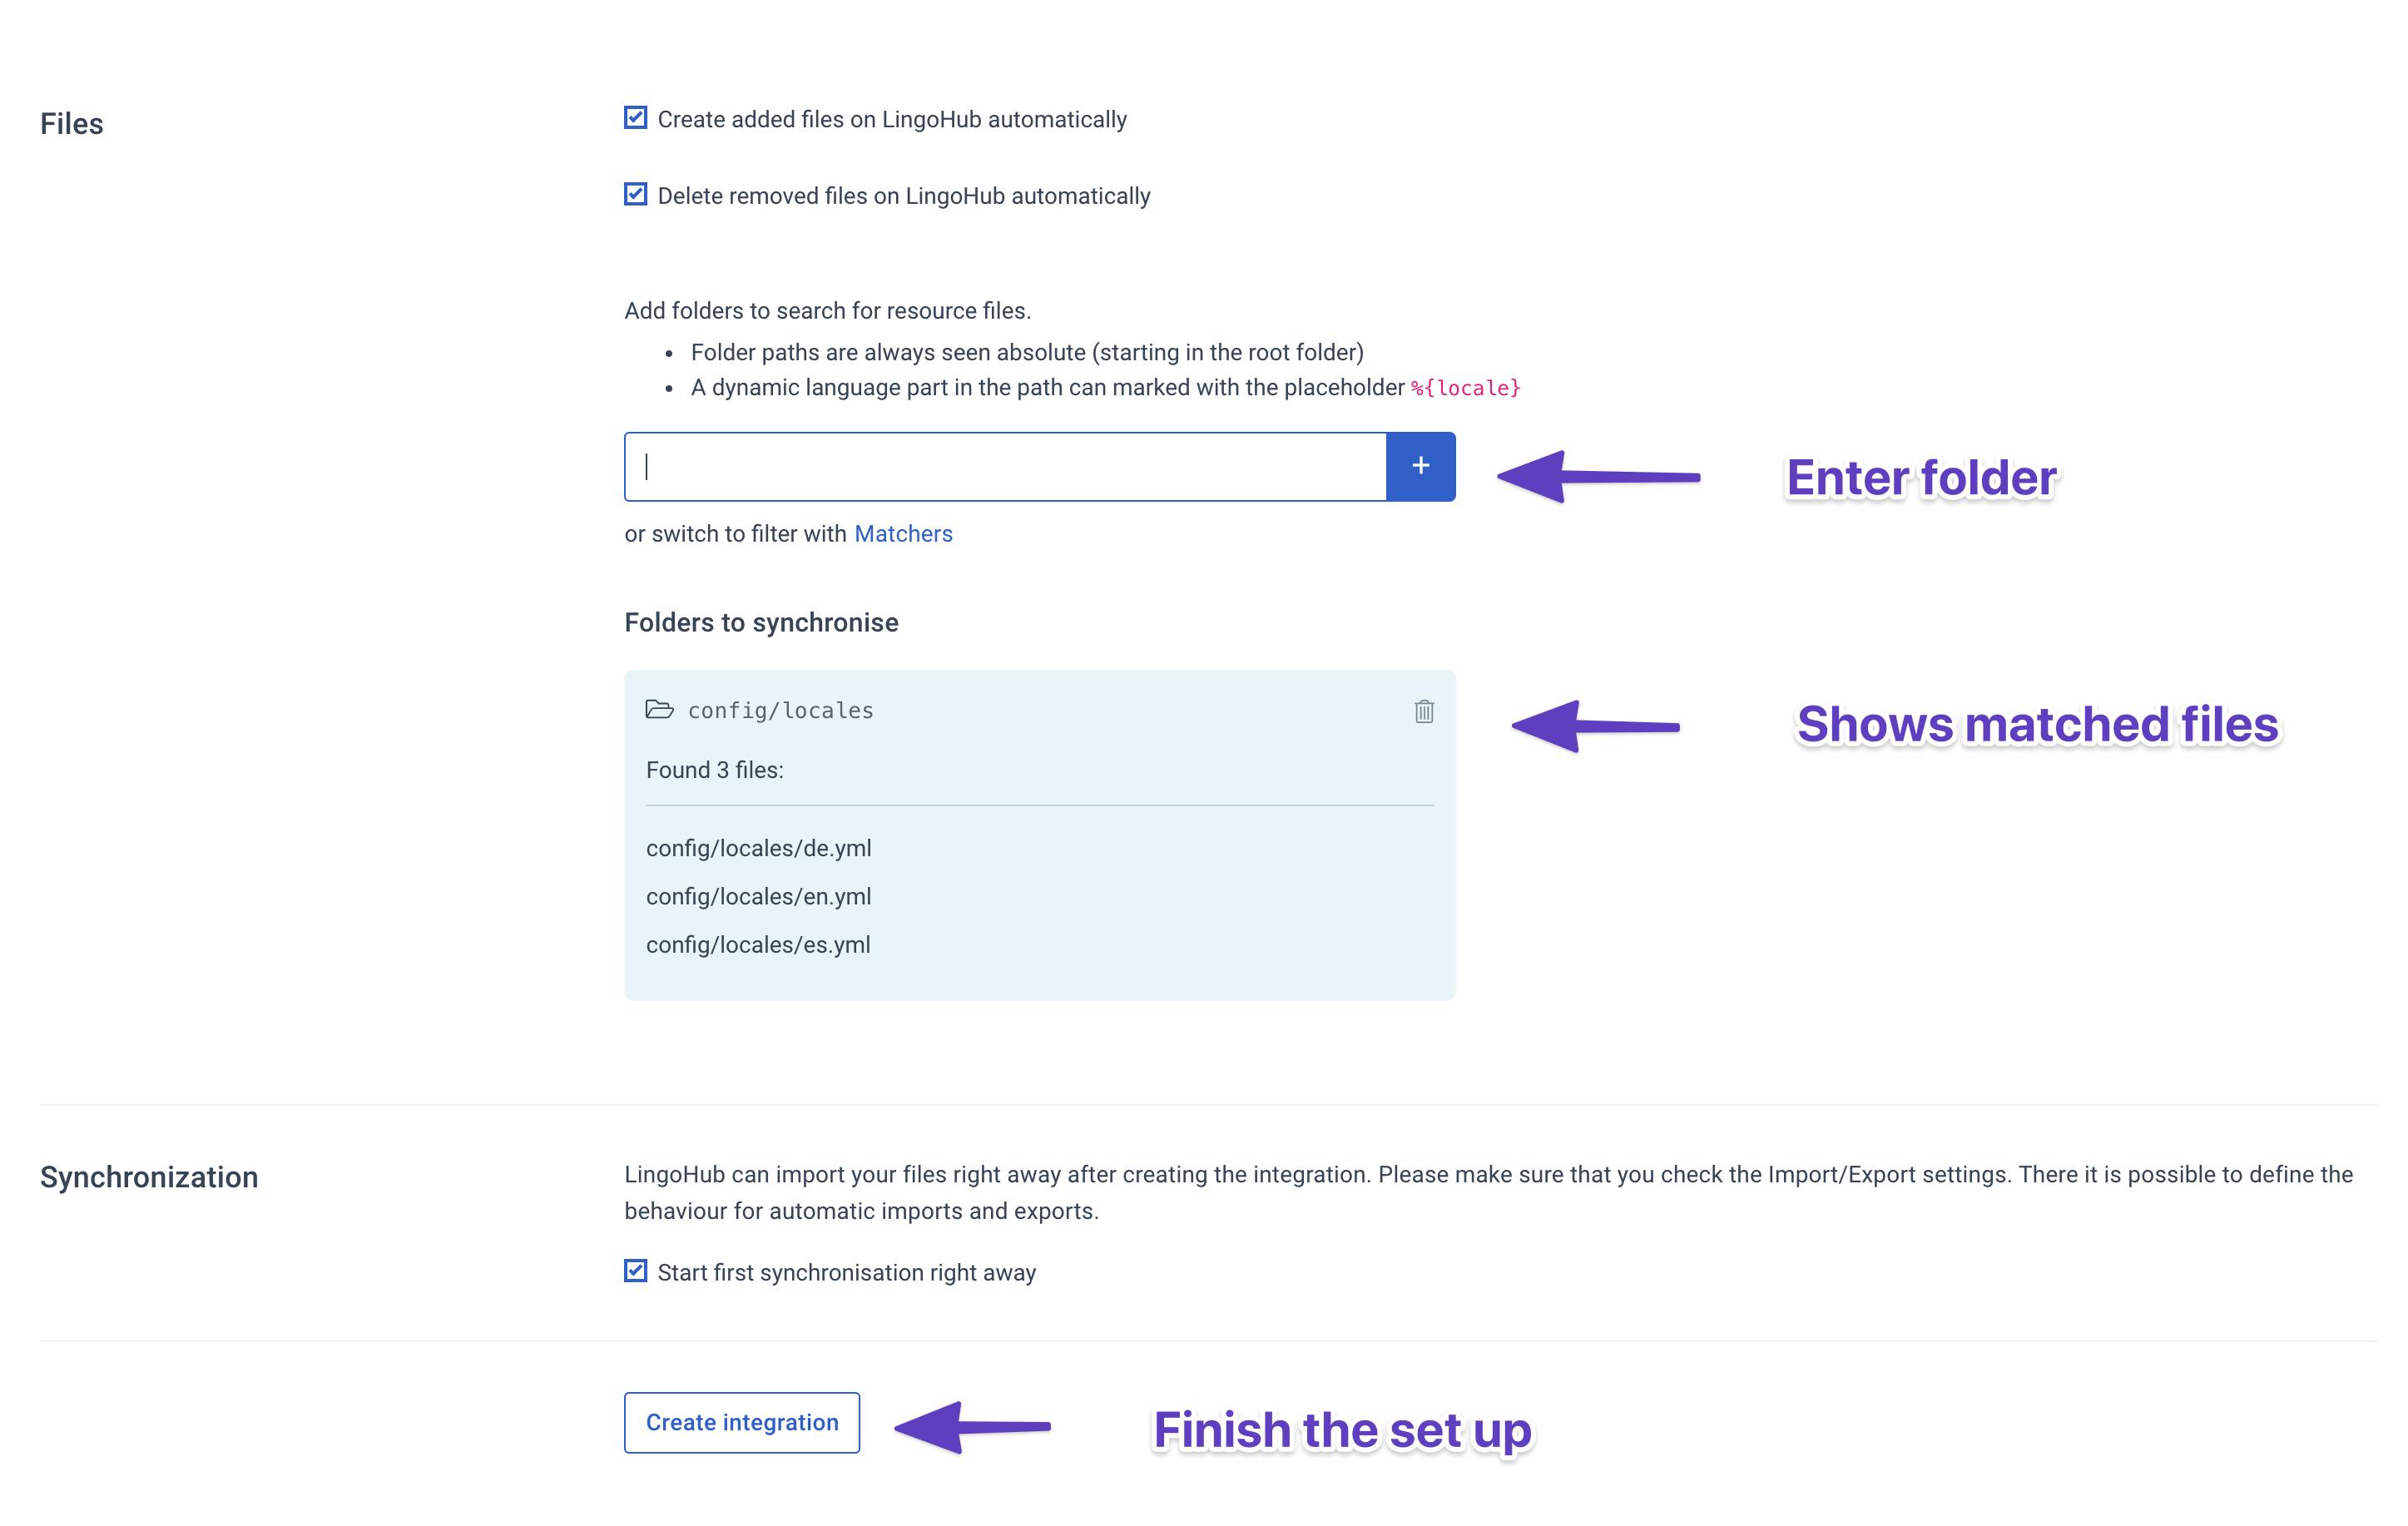 Finish GitHub setup